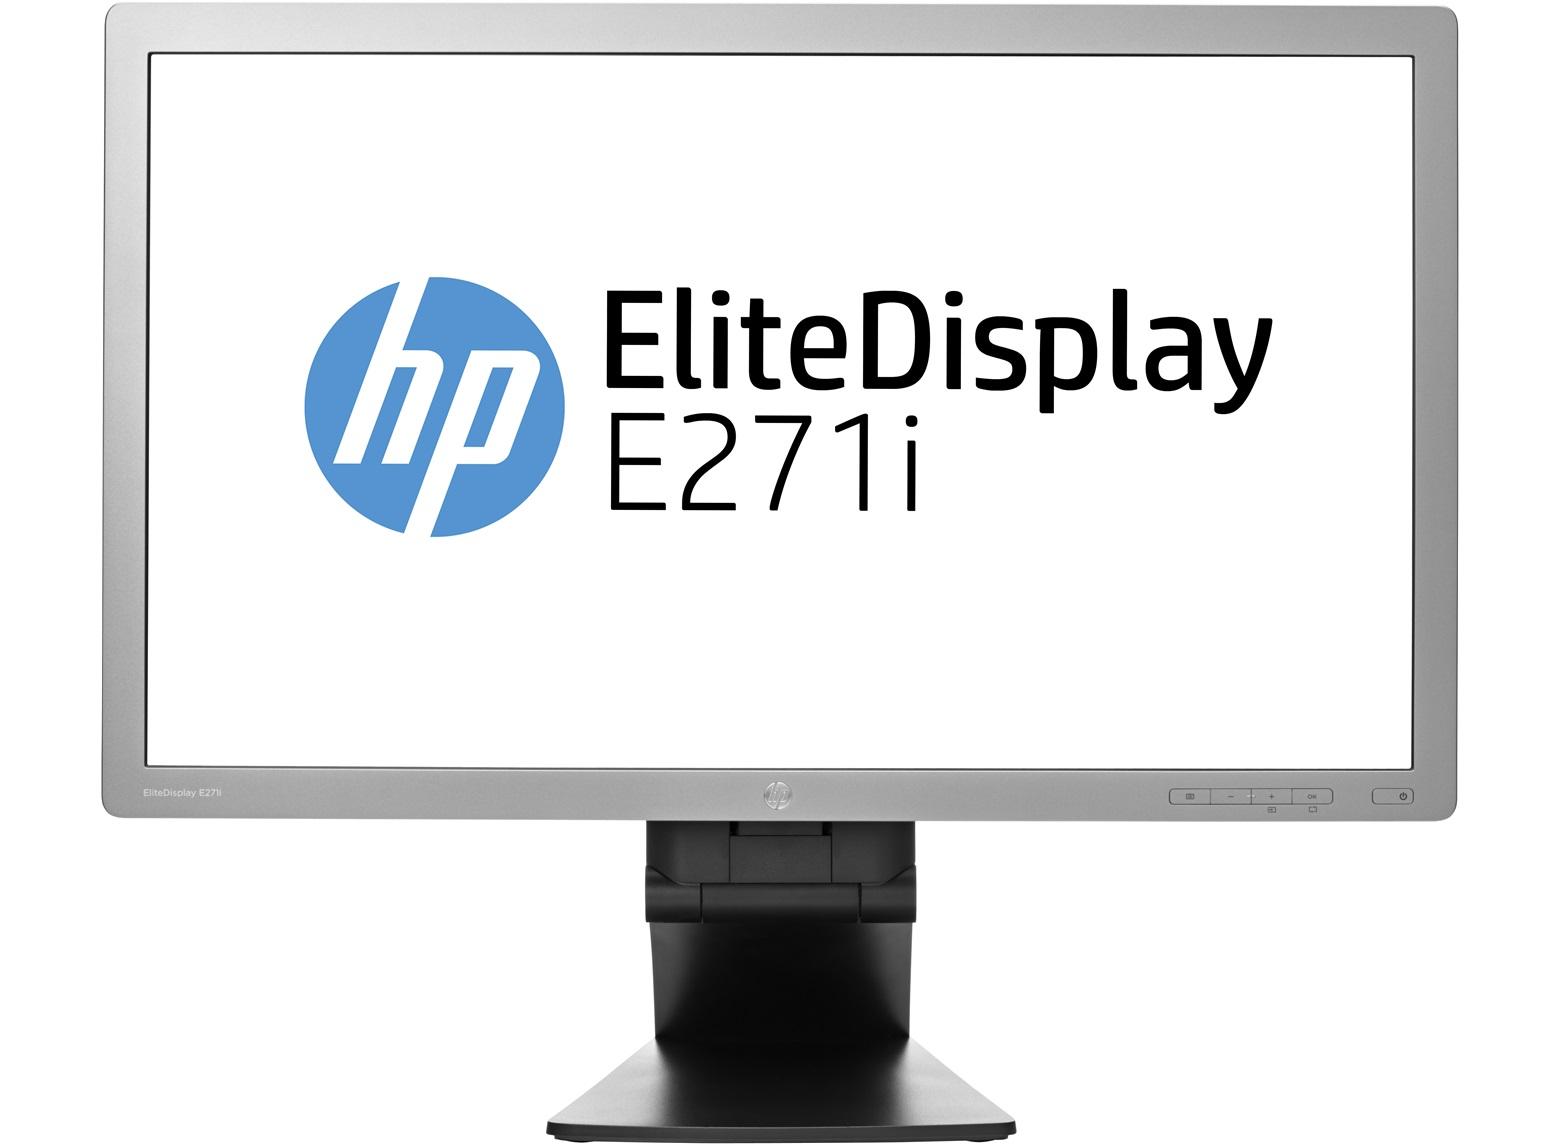 Hp Elitedisplay E271i 27 Inch Led Backlit Monitor Model